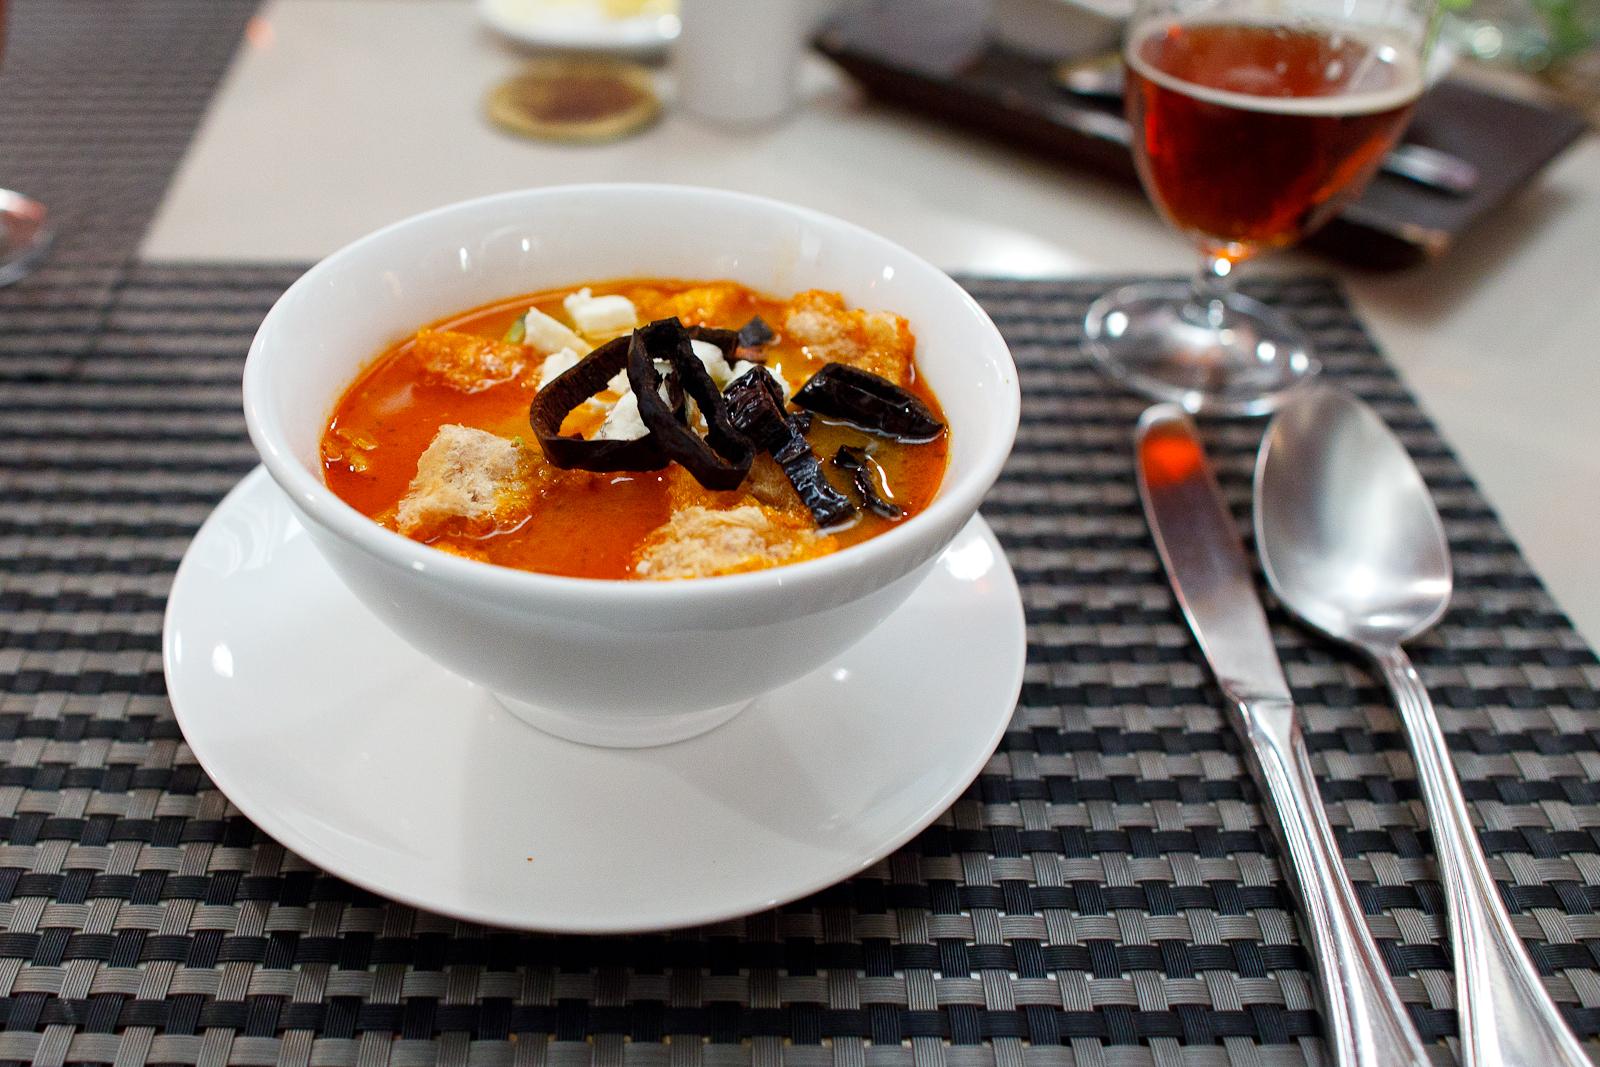 La sopa Azteca, tiras de tortilla en caldillo de jitomate servido con trocitos de aguacate, chile pasillo, chicharrón, queso fresco y crema de rancho (60 MXP)